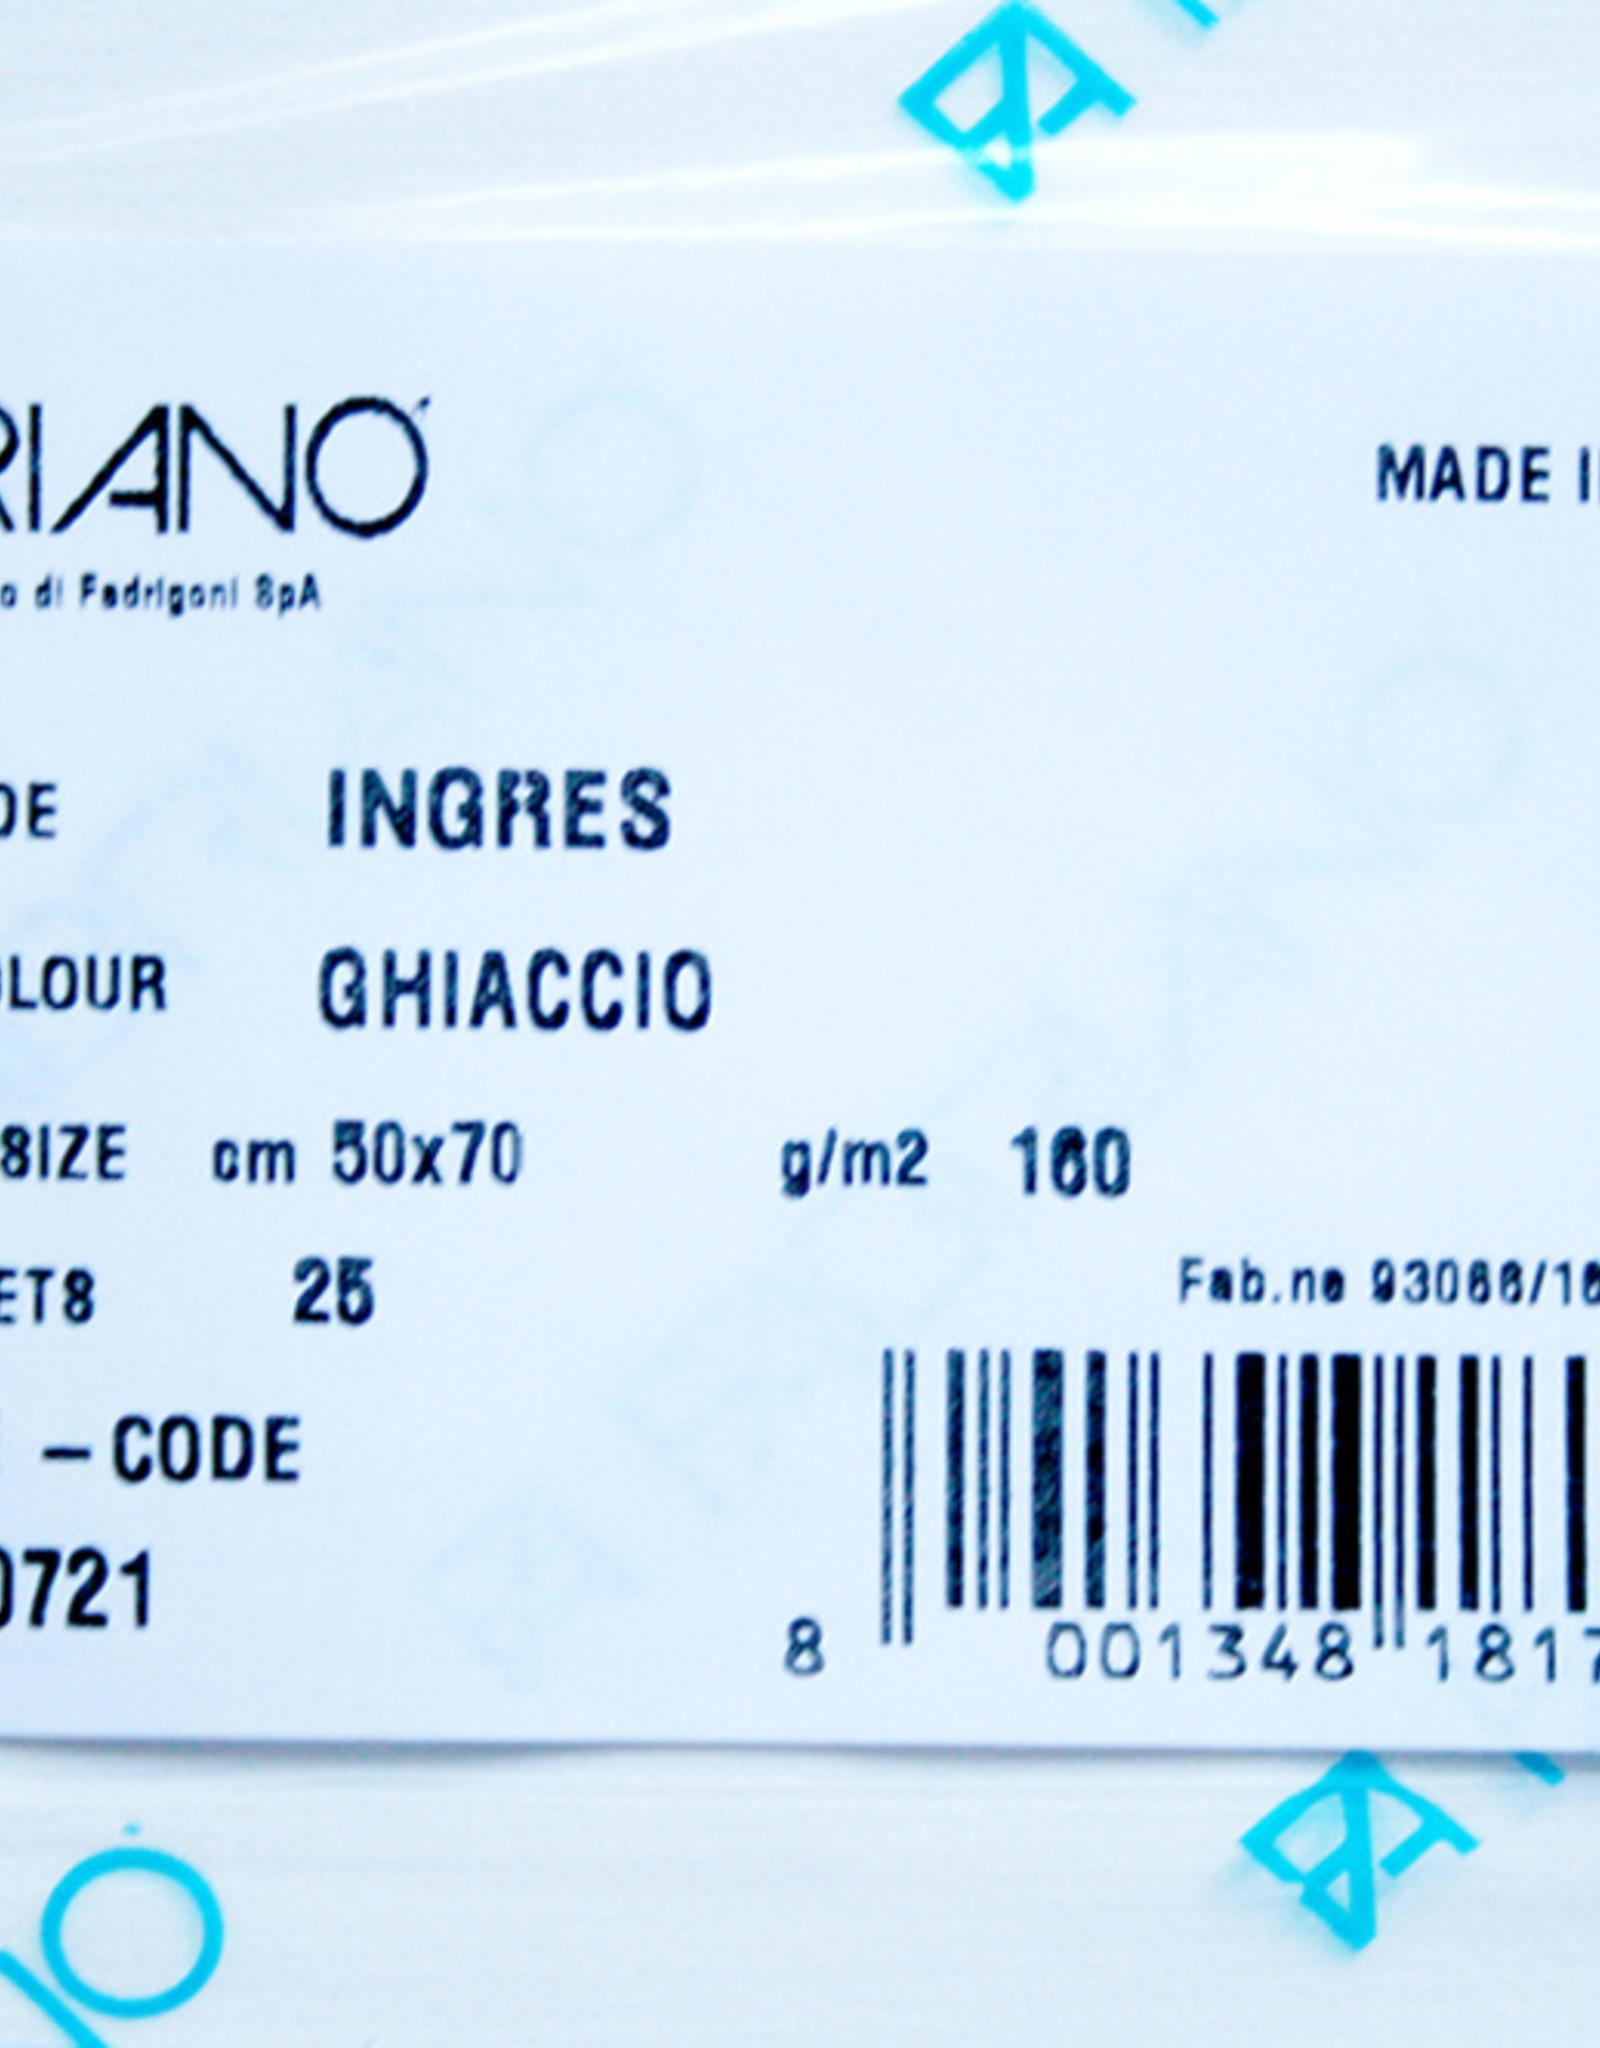 Fabriano 5 vel Ingres Papier 50 x 70 cm 160 grs Ghiaccio Levend Wit